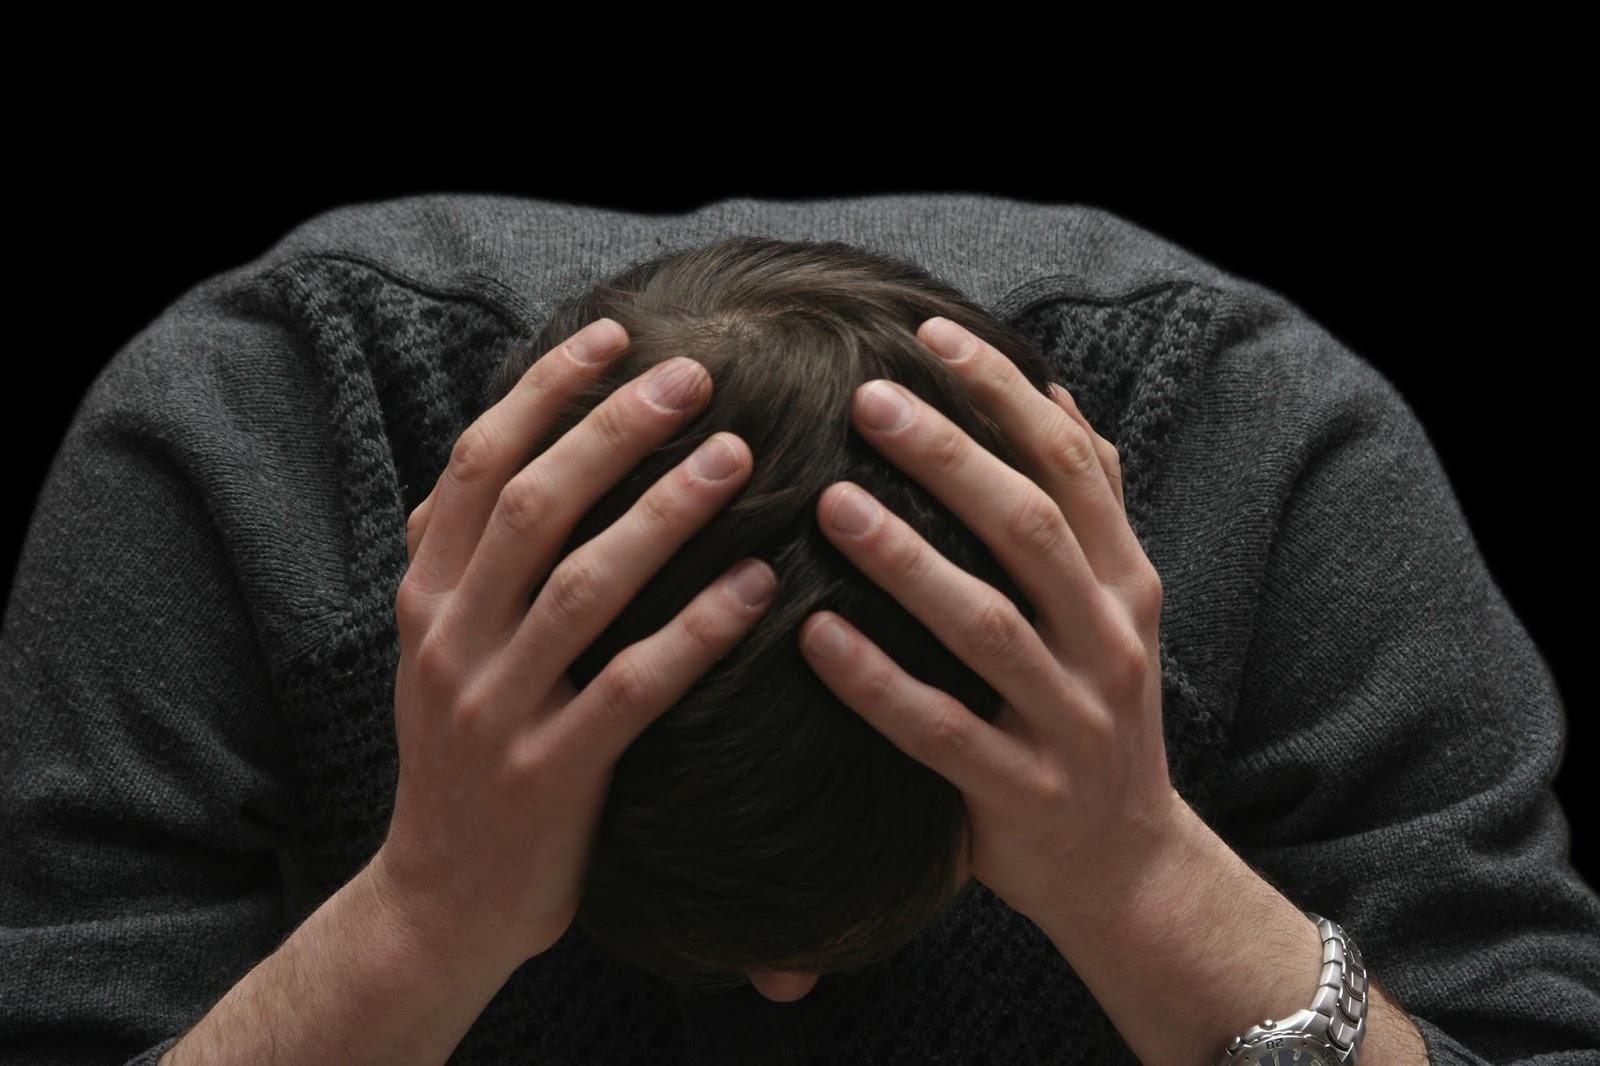 5,5 лет и 400 тысяч: приговор тверского суда за удар молотком